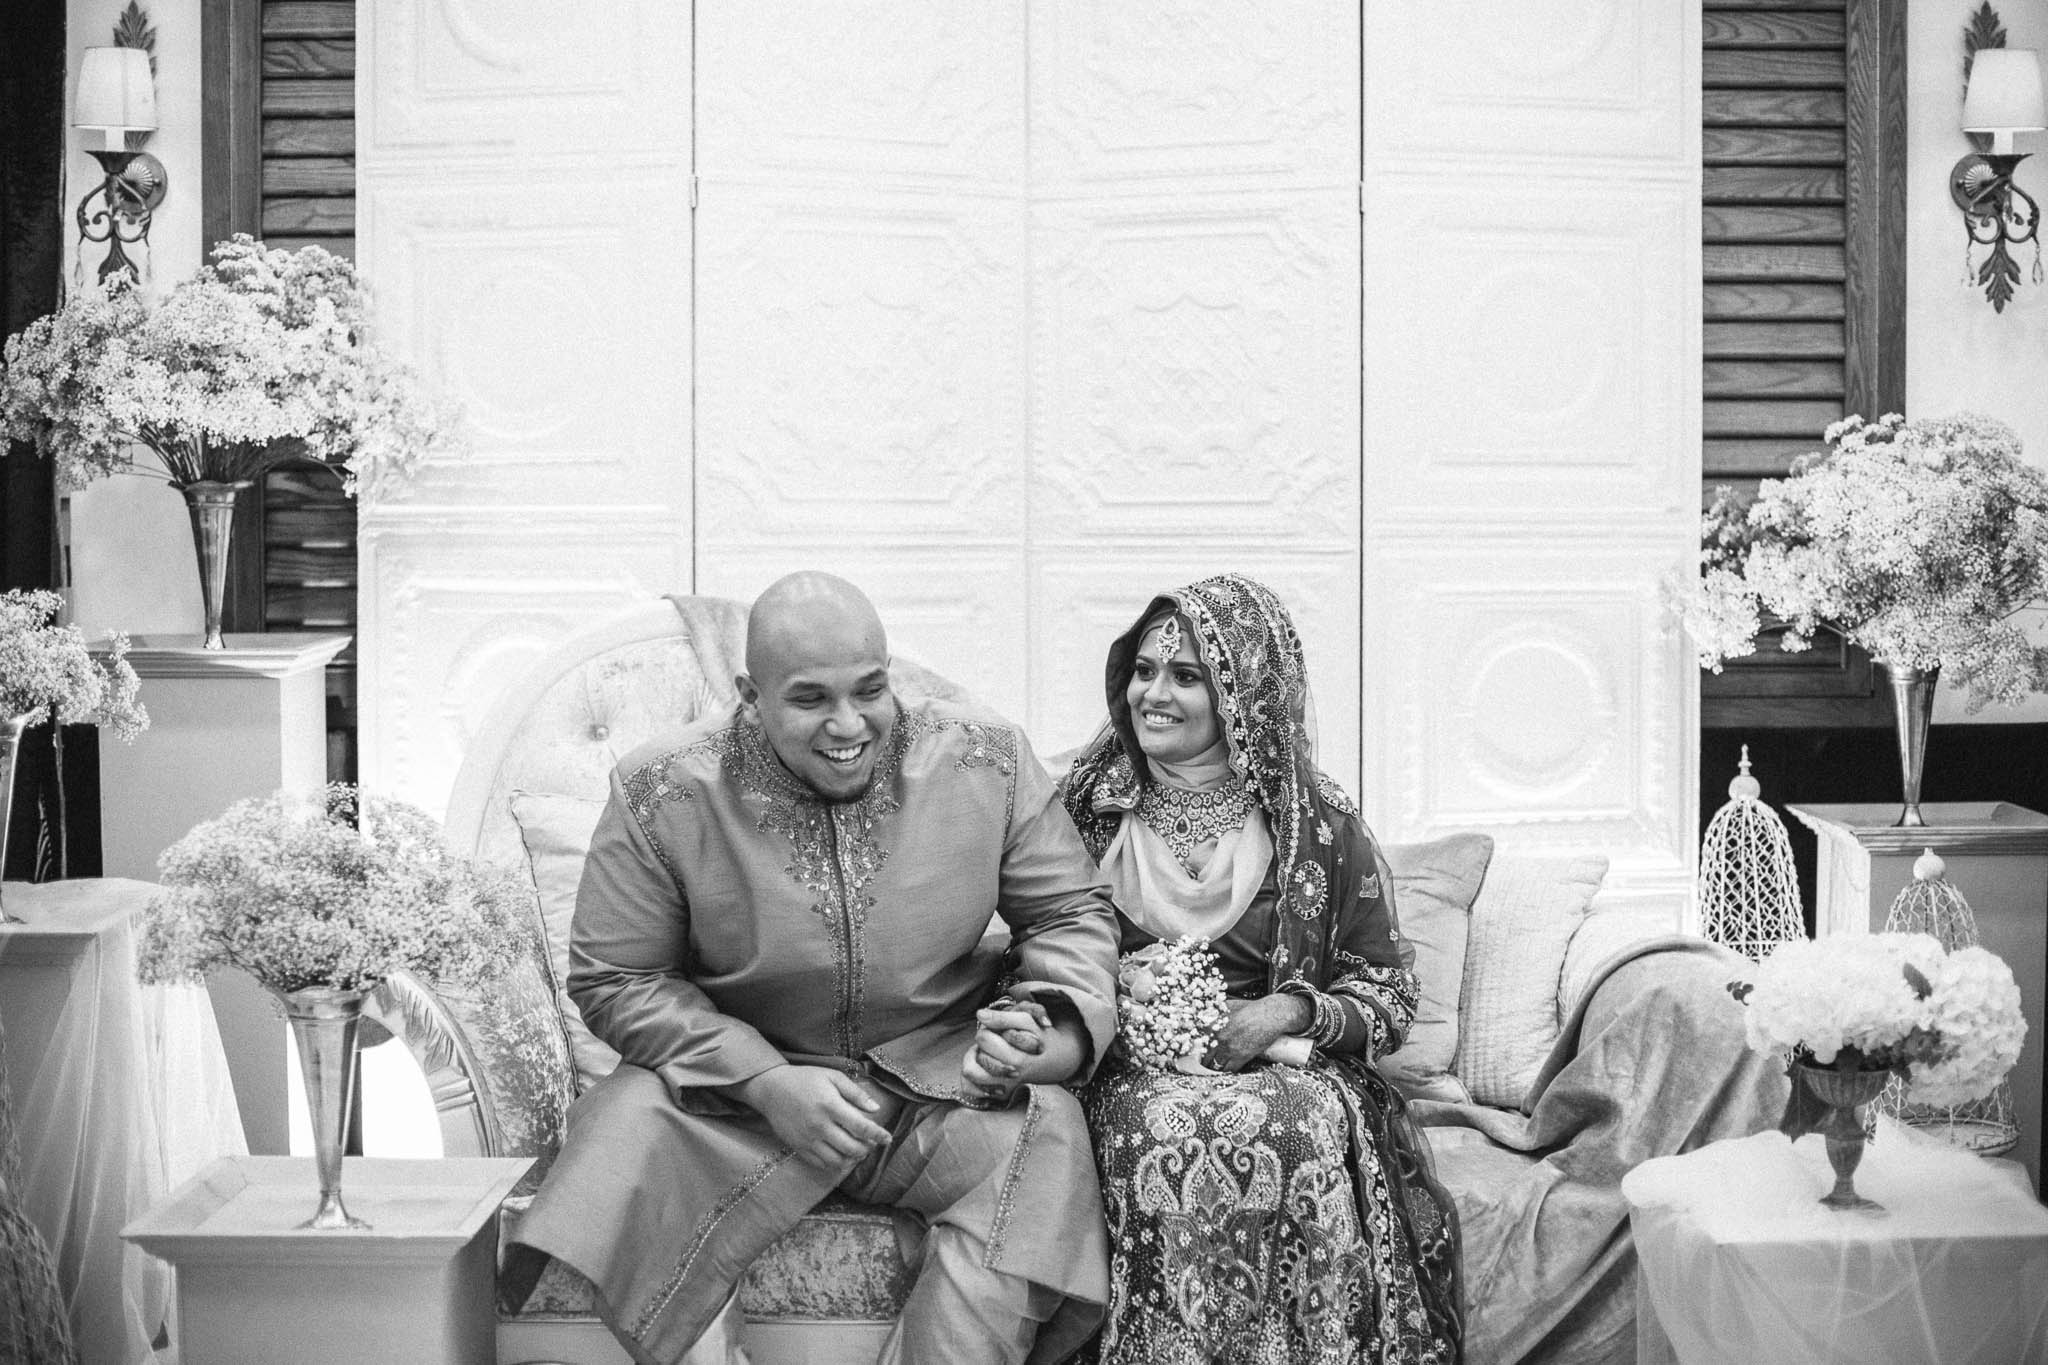 singapore-wedding-photographer-malay-indian-pre-wedding-travel-wmt-2015-shereen-farid-54.jpg